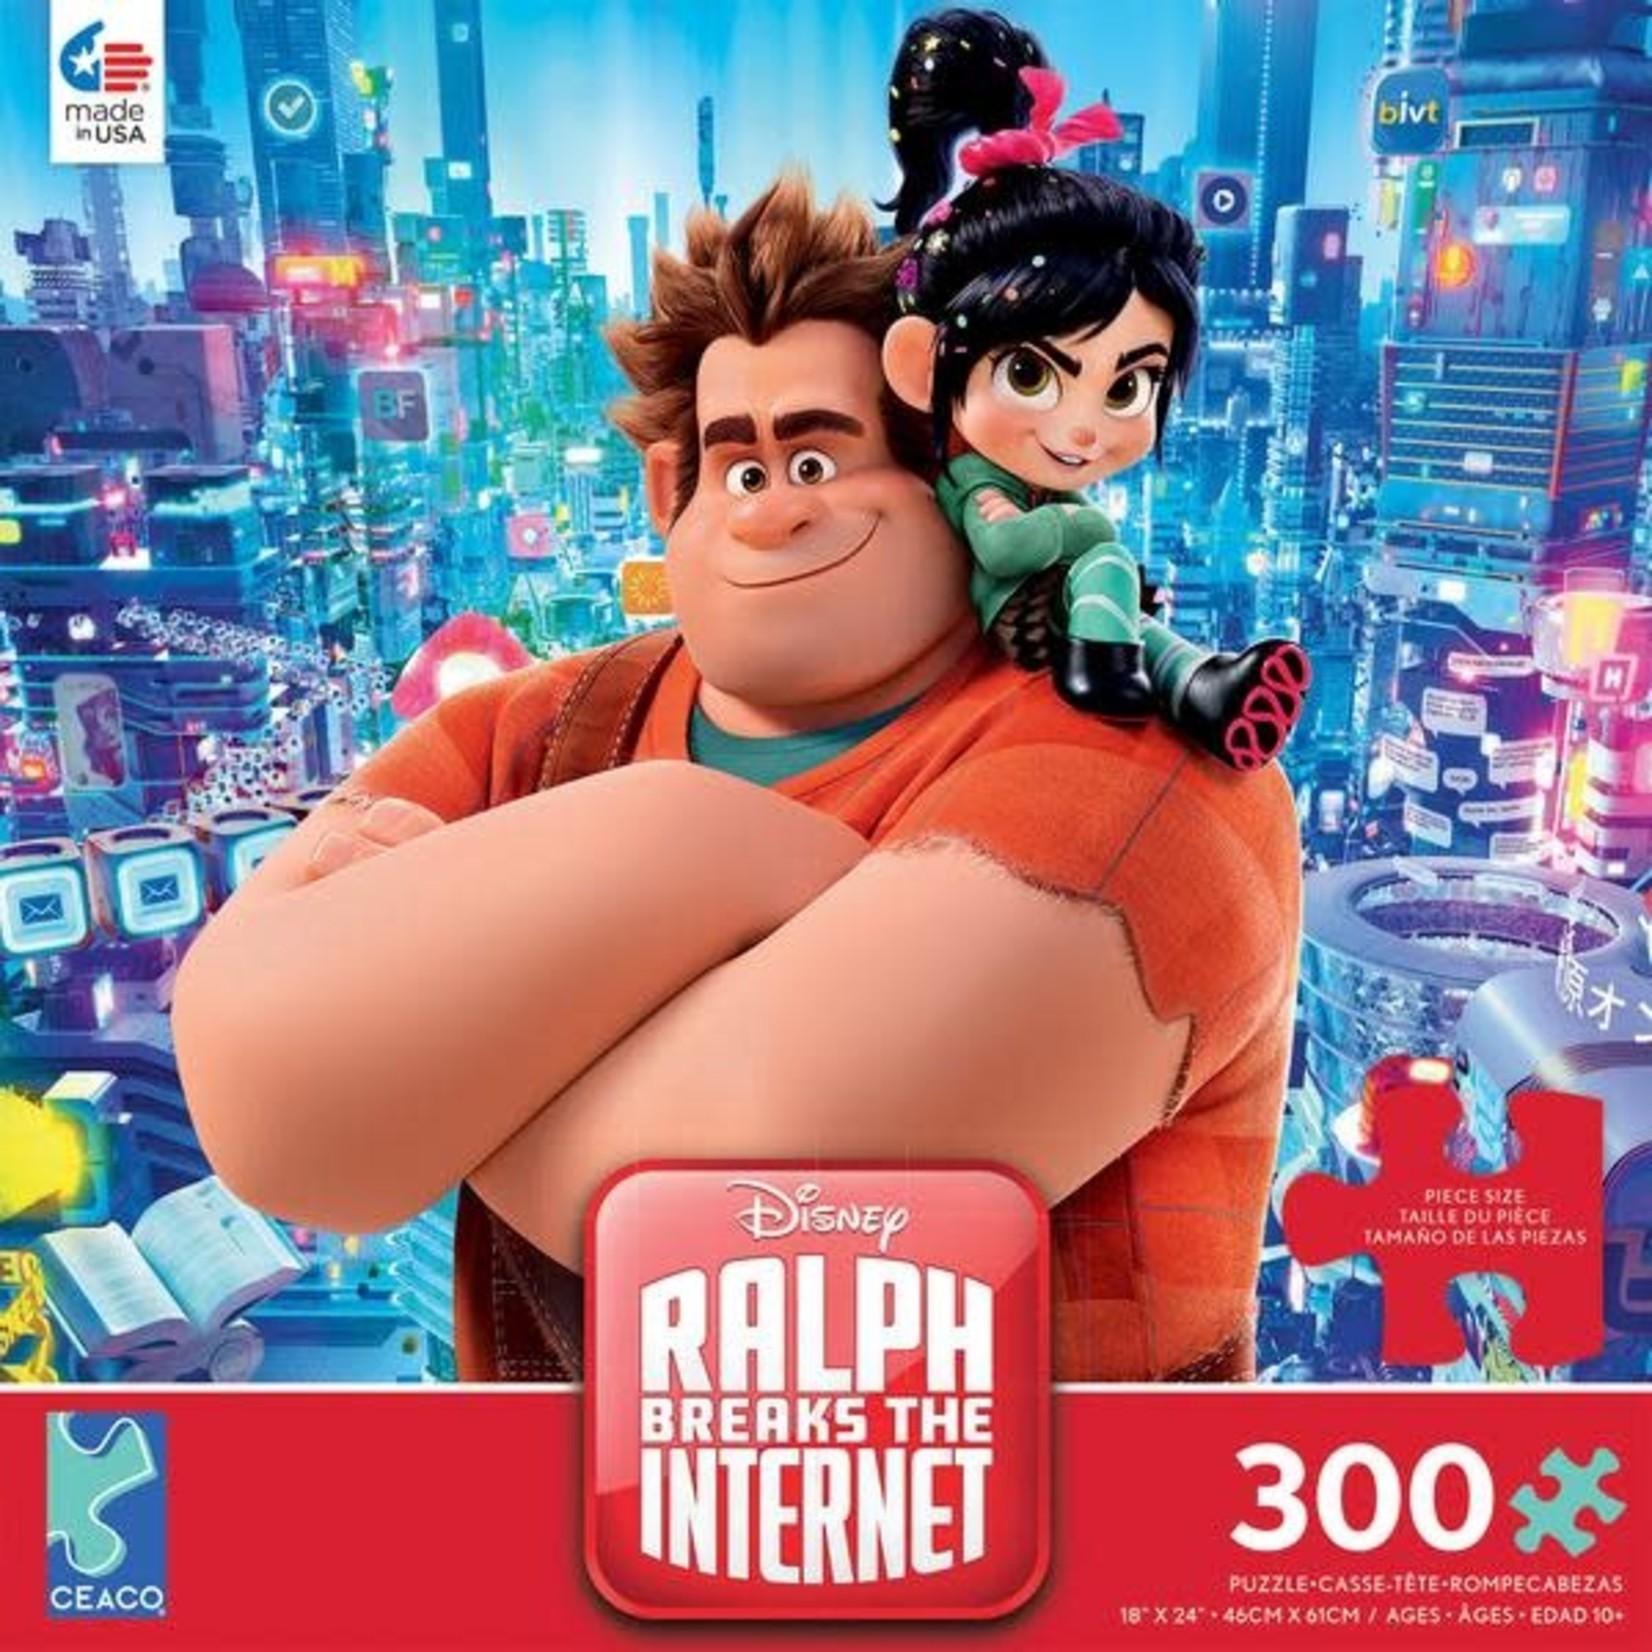 ceaco Ceaco - 300 Piece Puzzle: Disney Collection - Ralph Breaks The Internet